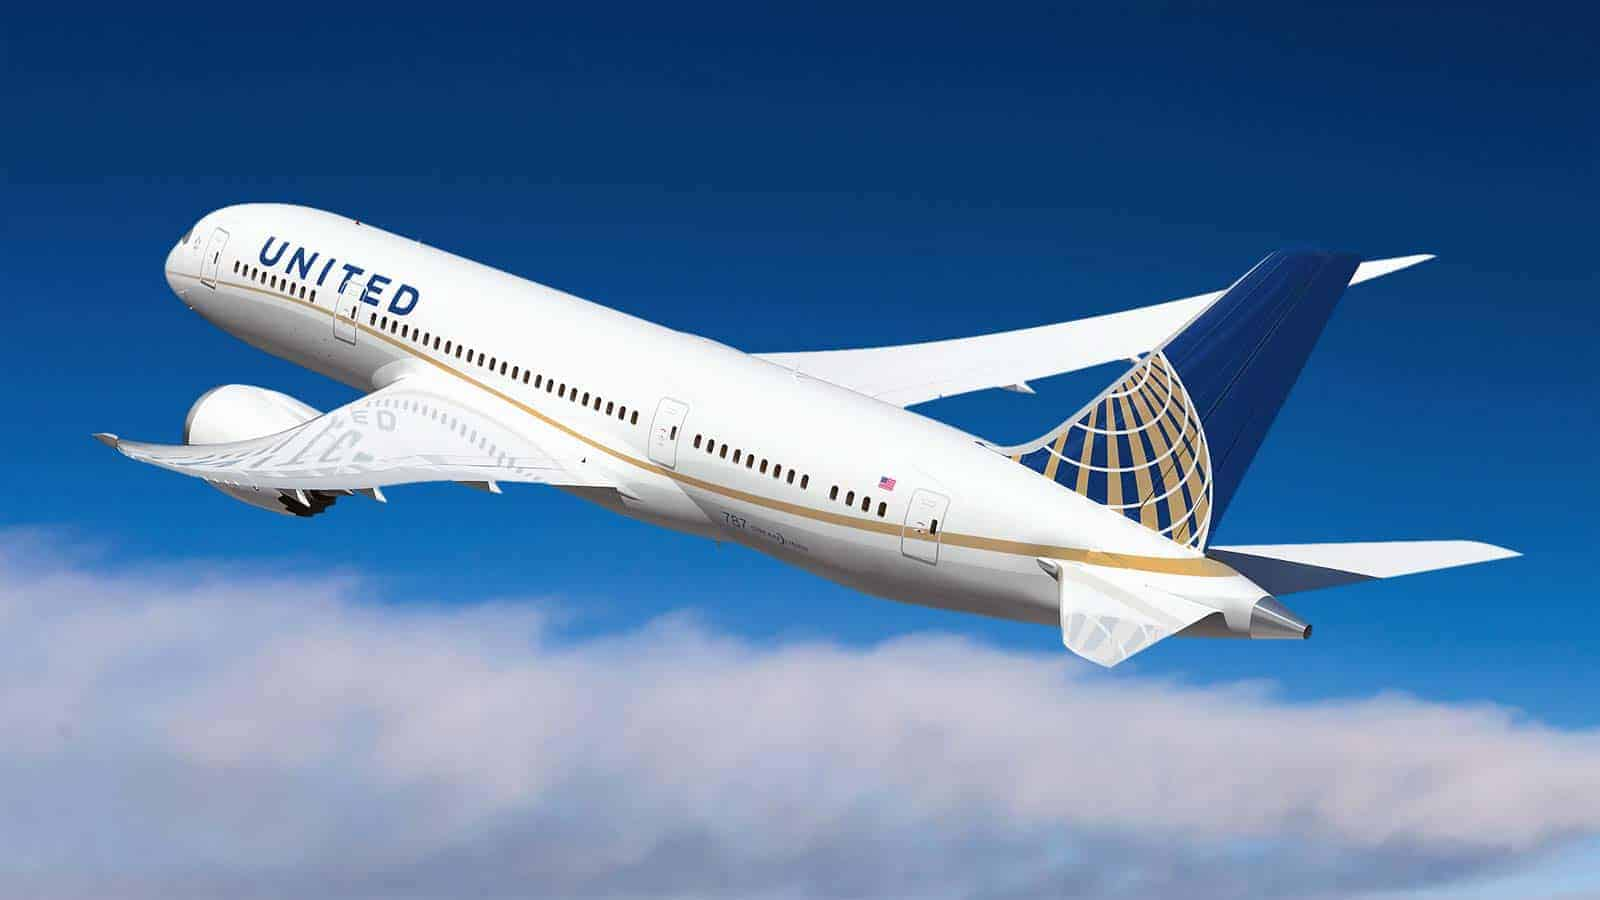 Avião da United Airlines